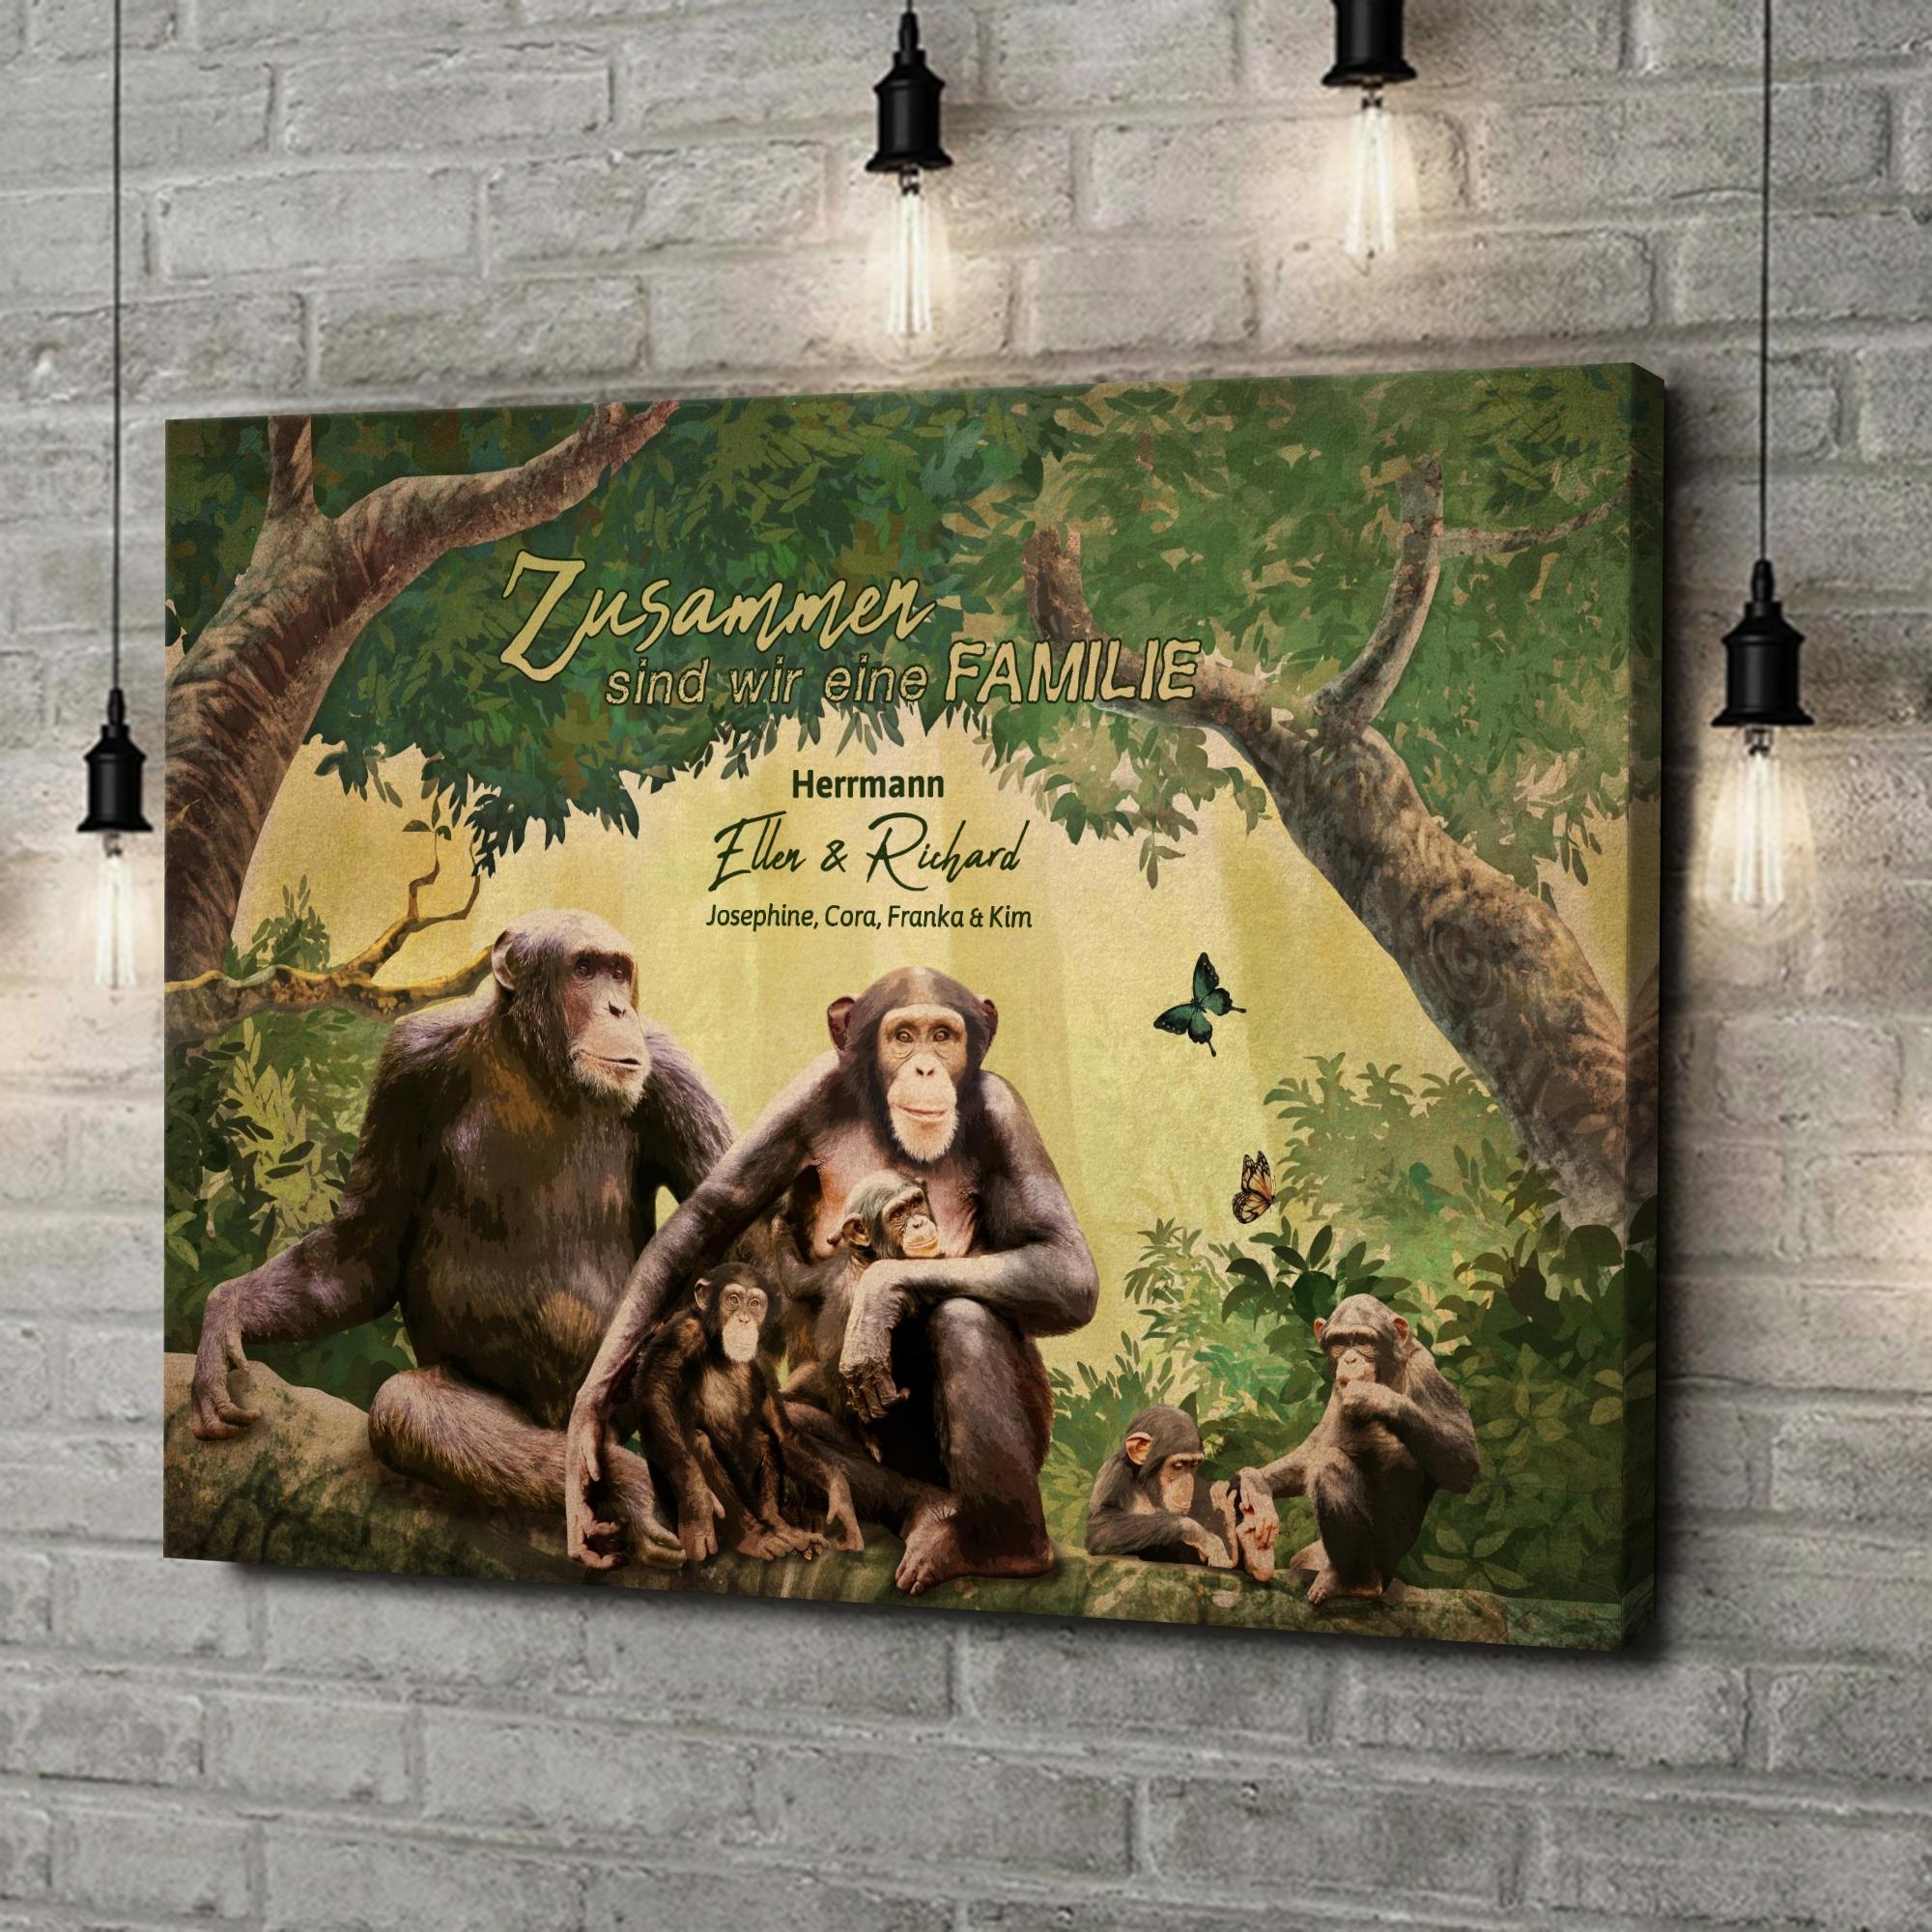 Leinwandbild personalisiert Affenfamilie